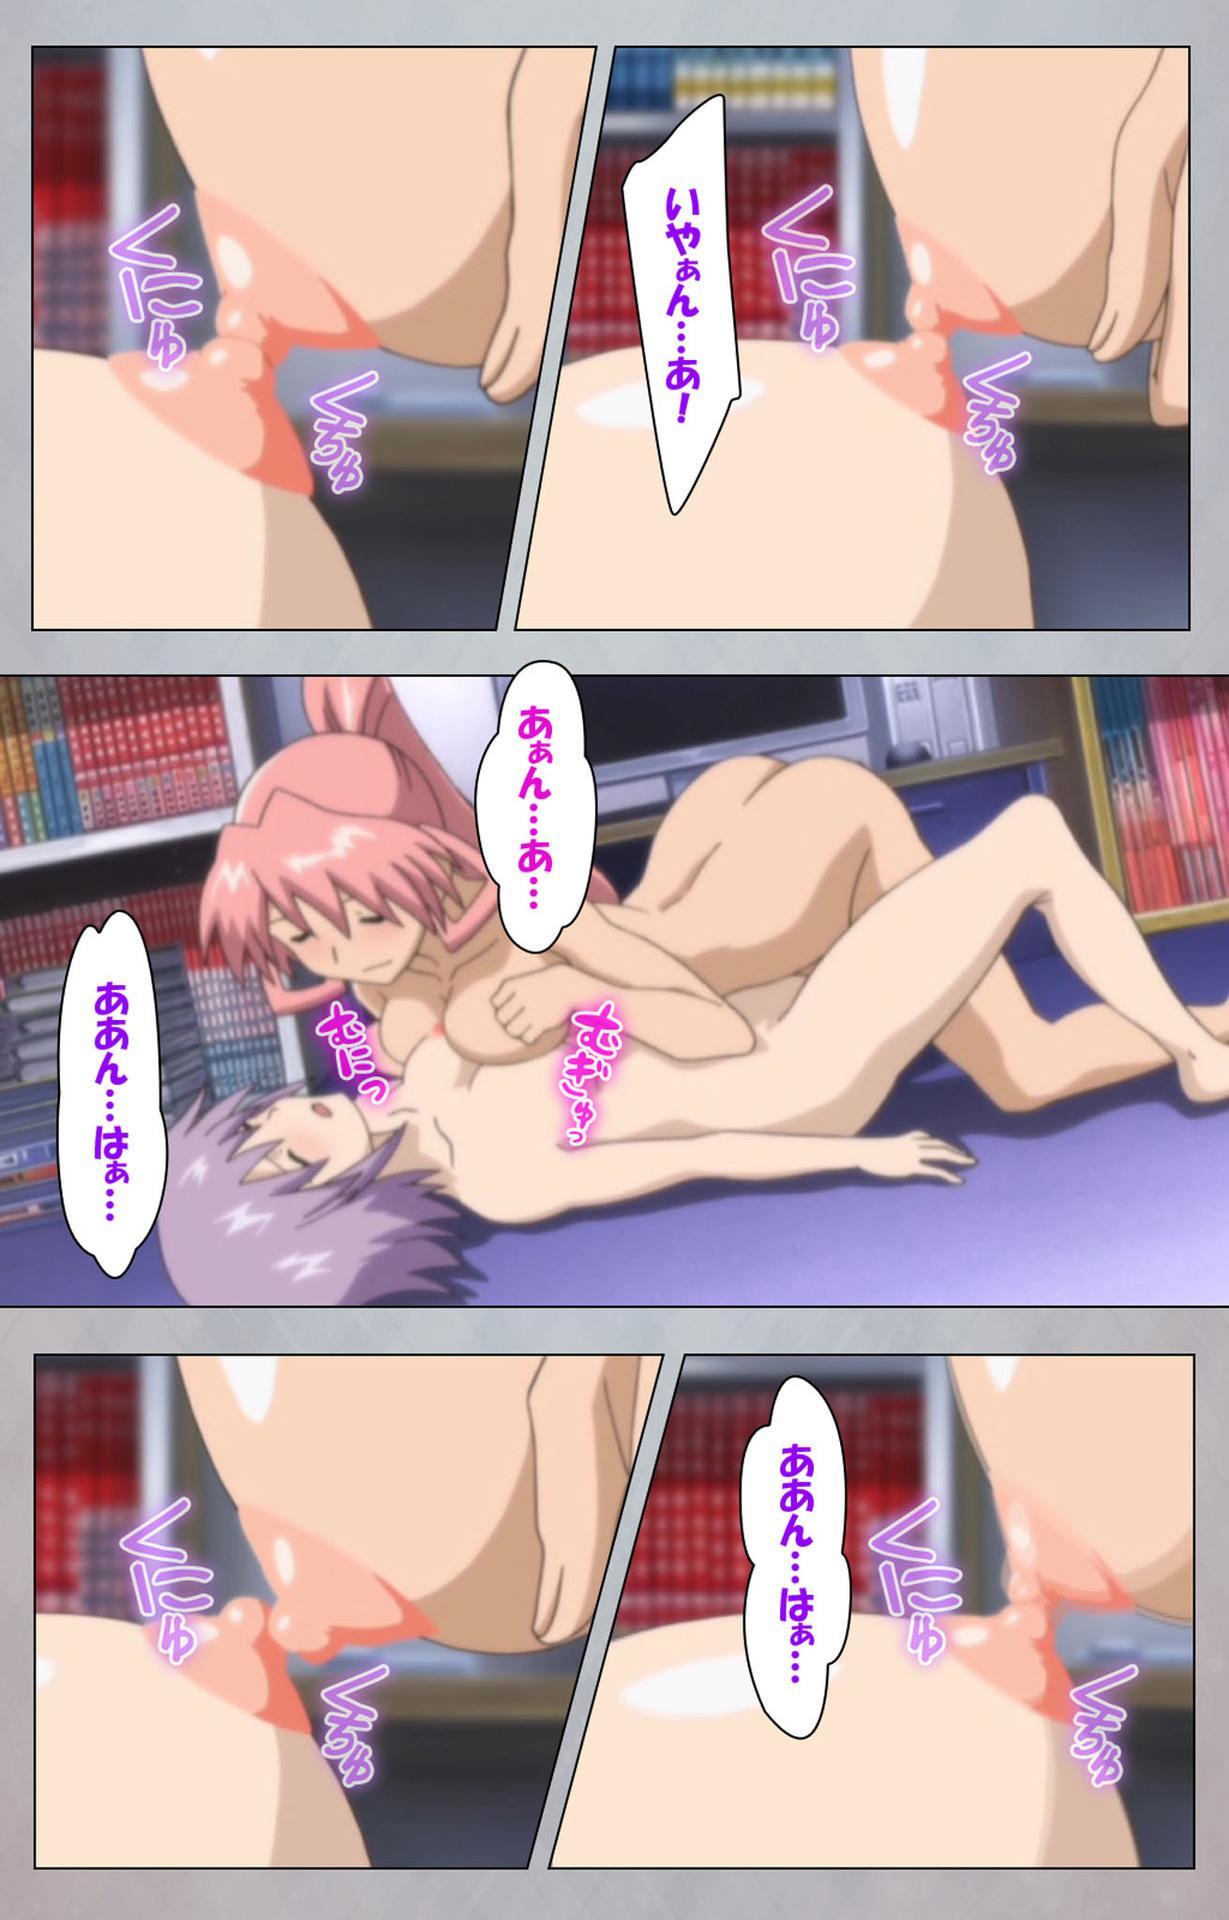 [Digital Works] [Full Color Seijin Ban] Sex Android ~Risou no Onna de Nuite yaru~ Kanzenban 204